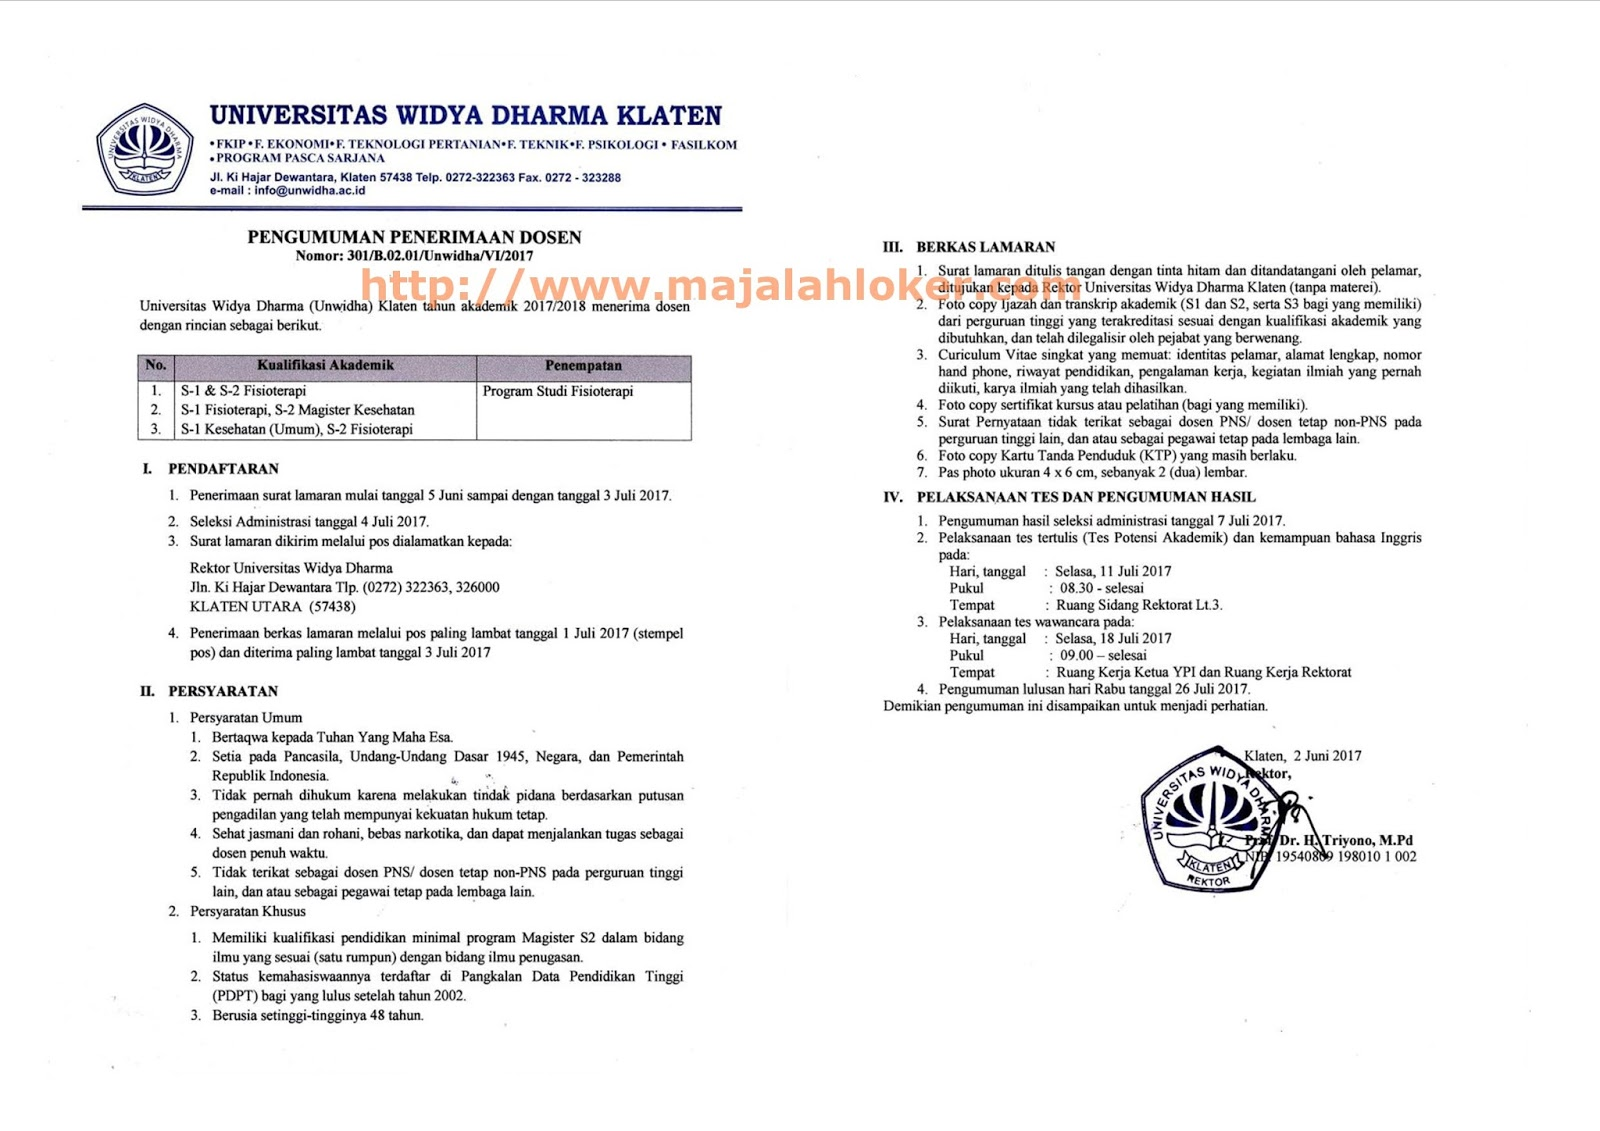 Lowongan Dosen Fisioterapi Universitas Widya Dharma